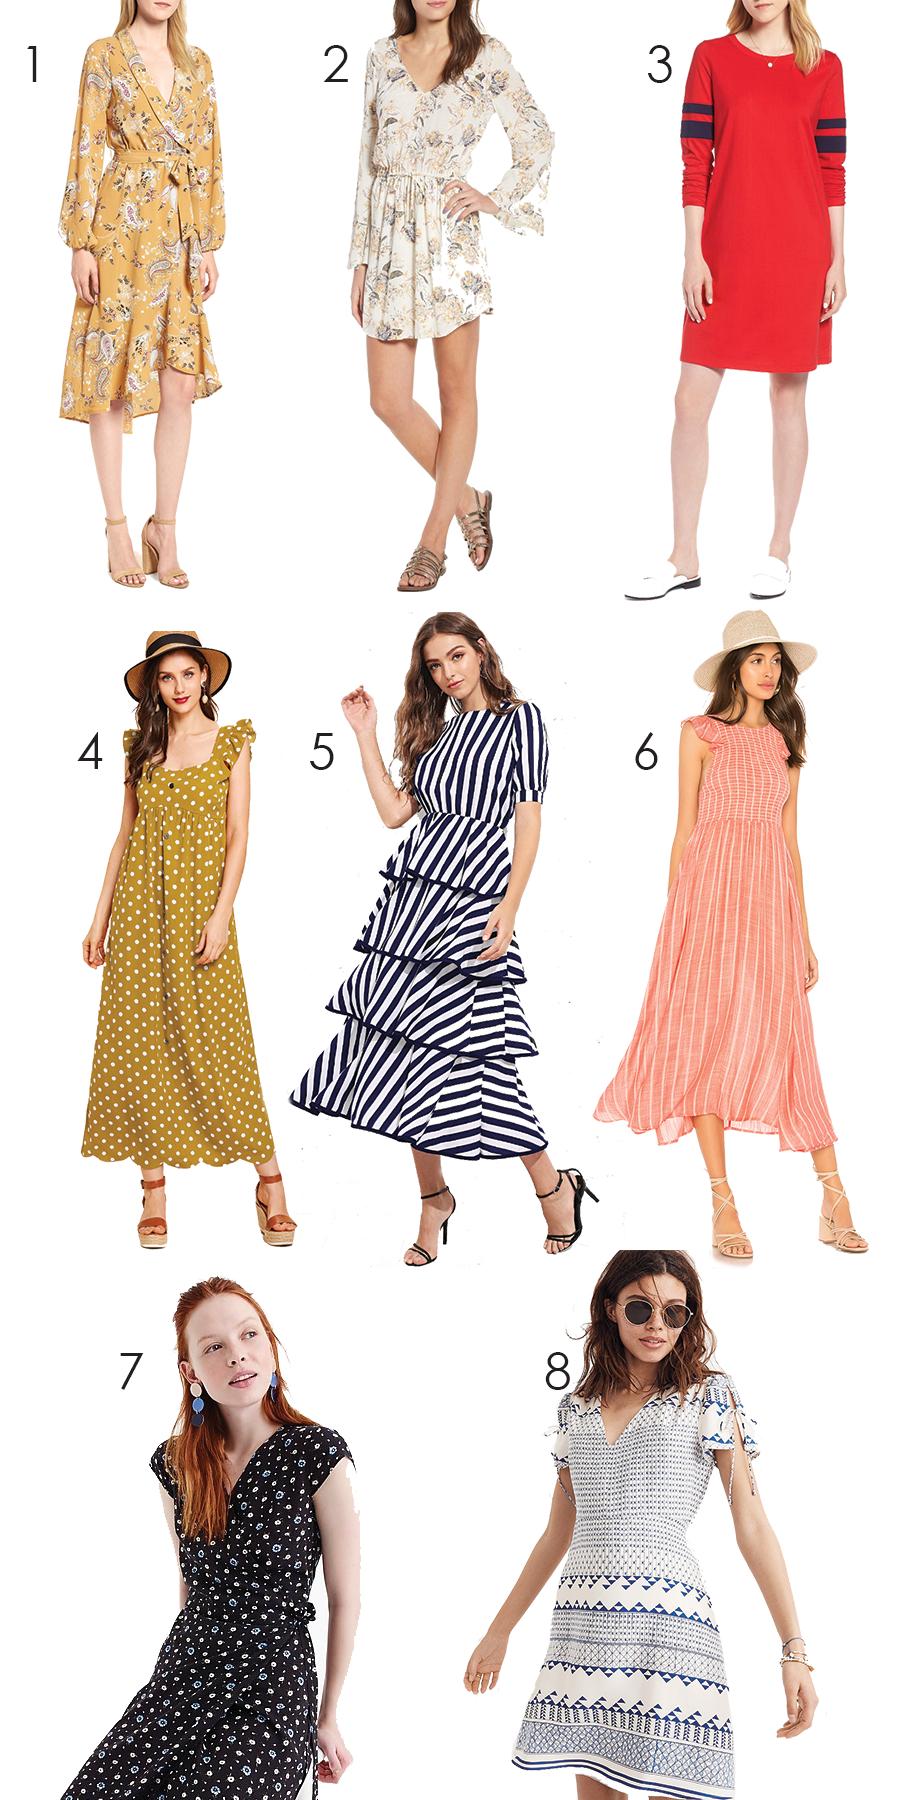 Summer Sundresses Under $100 I DreaminLace.com #SummerStyle #Fashionista #Style